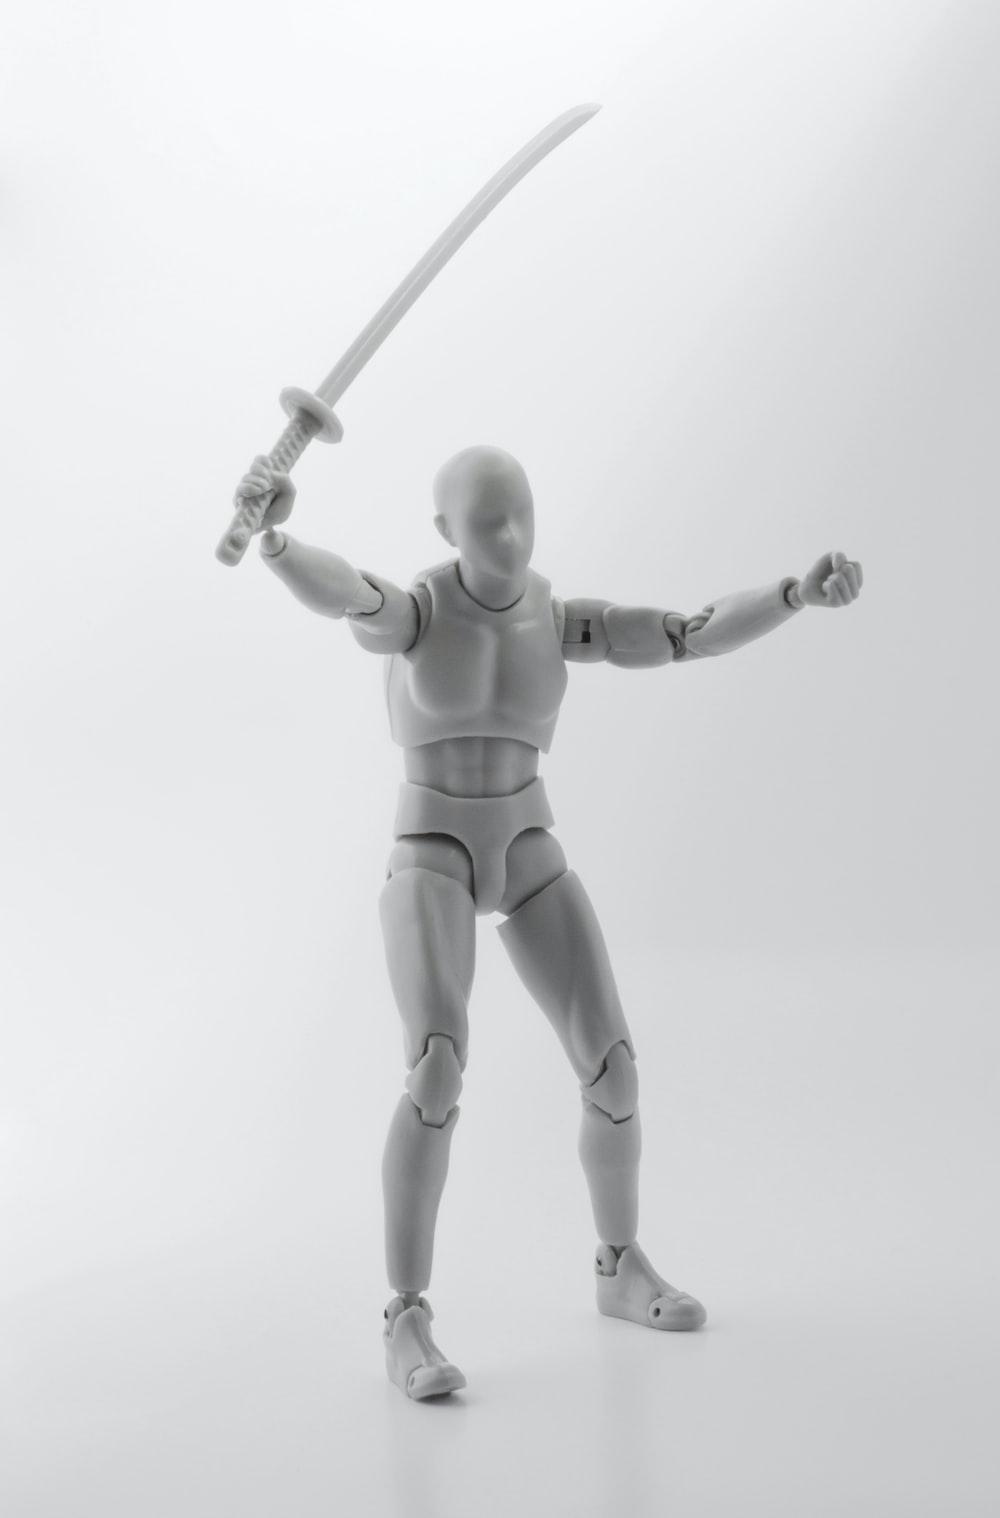 man holding sword action figure